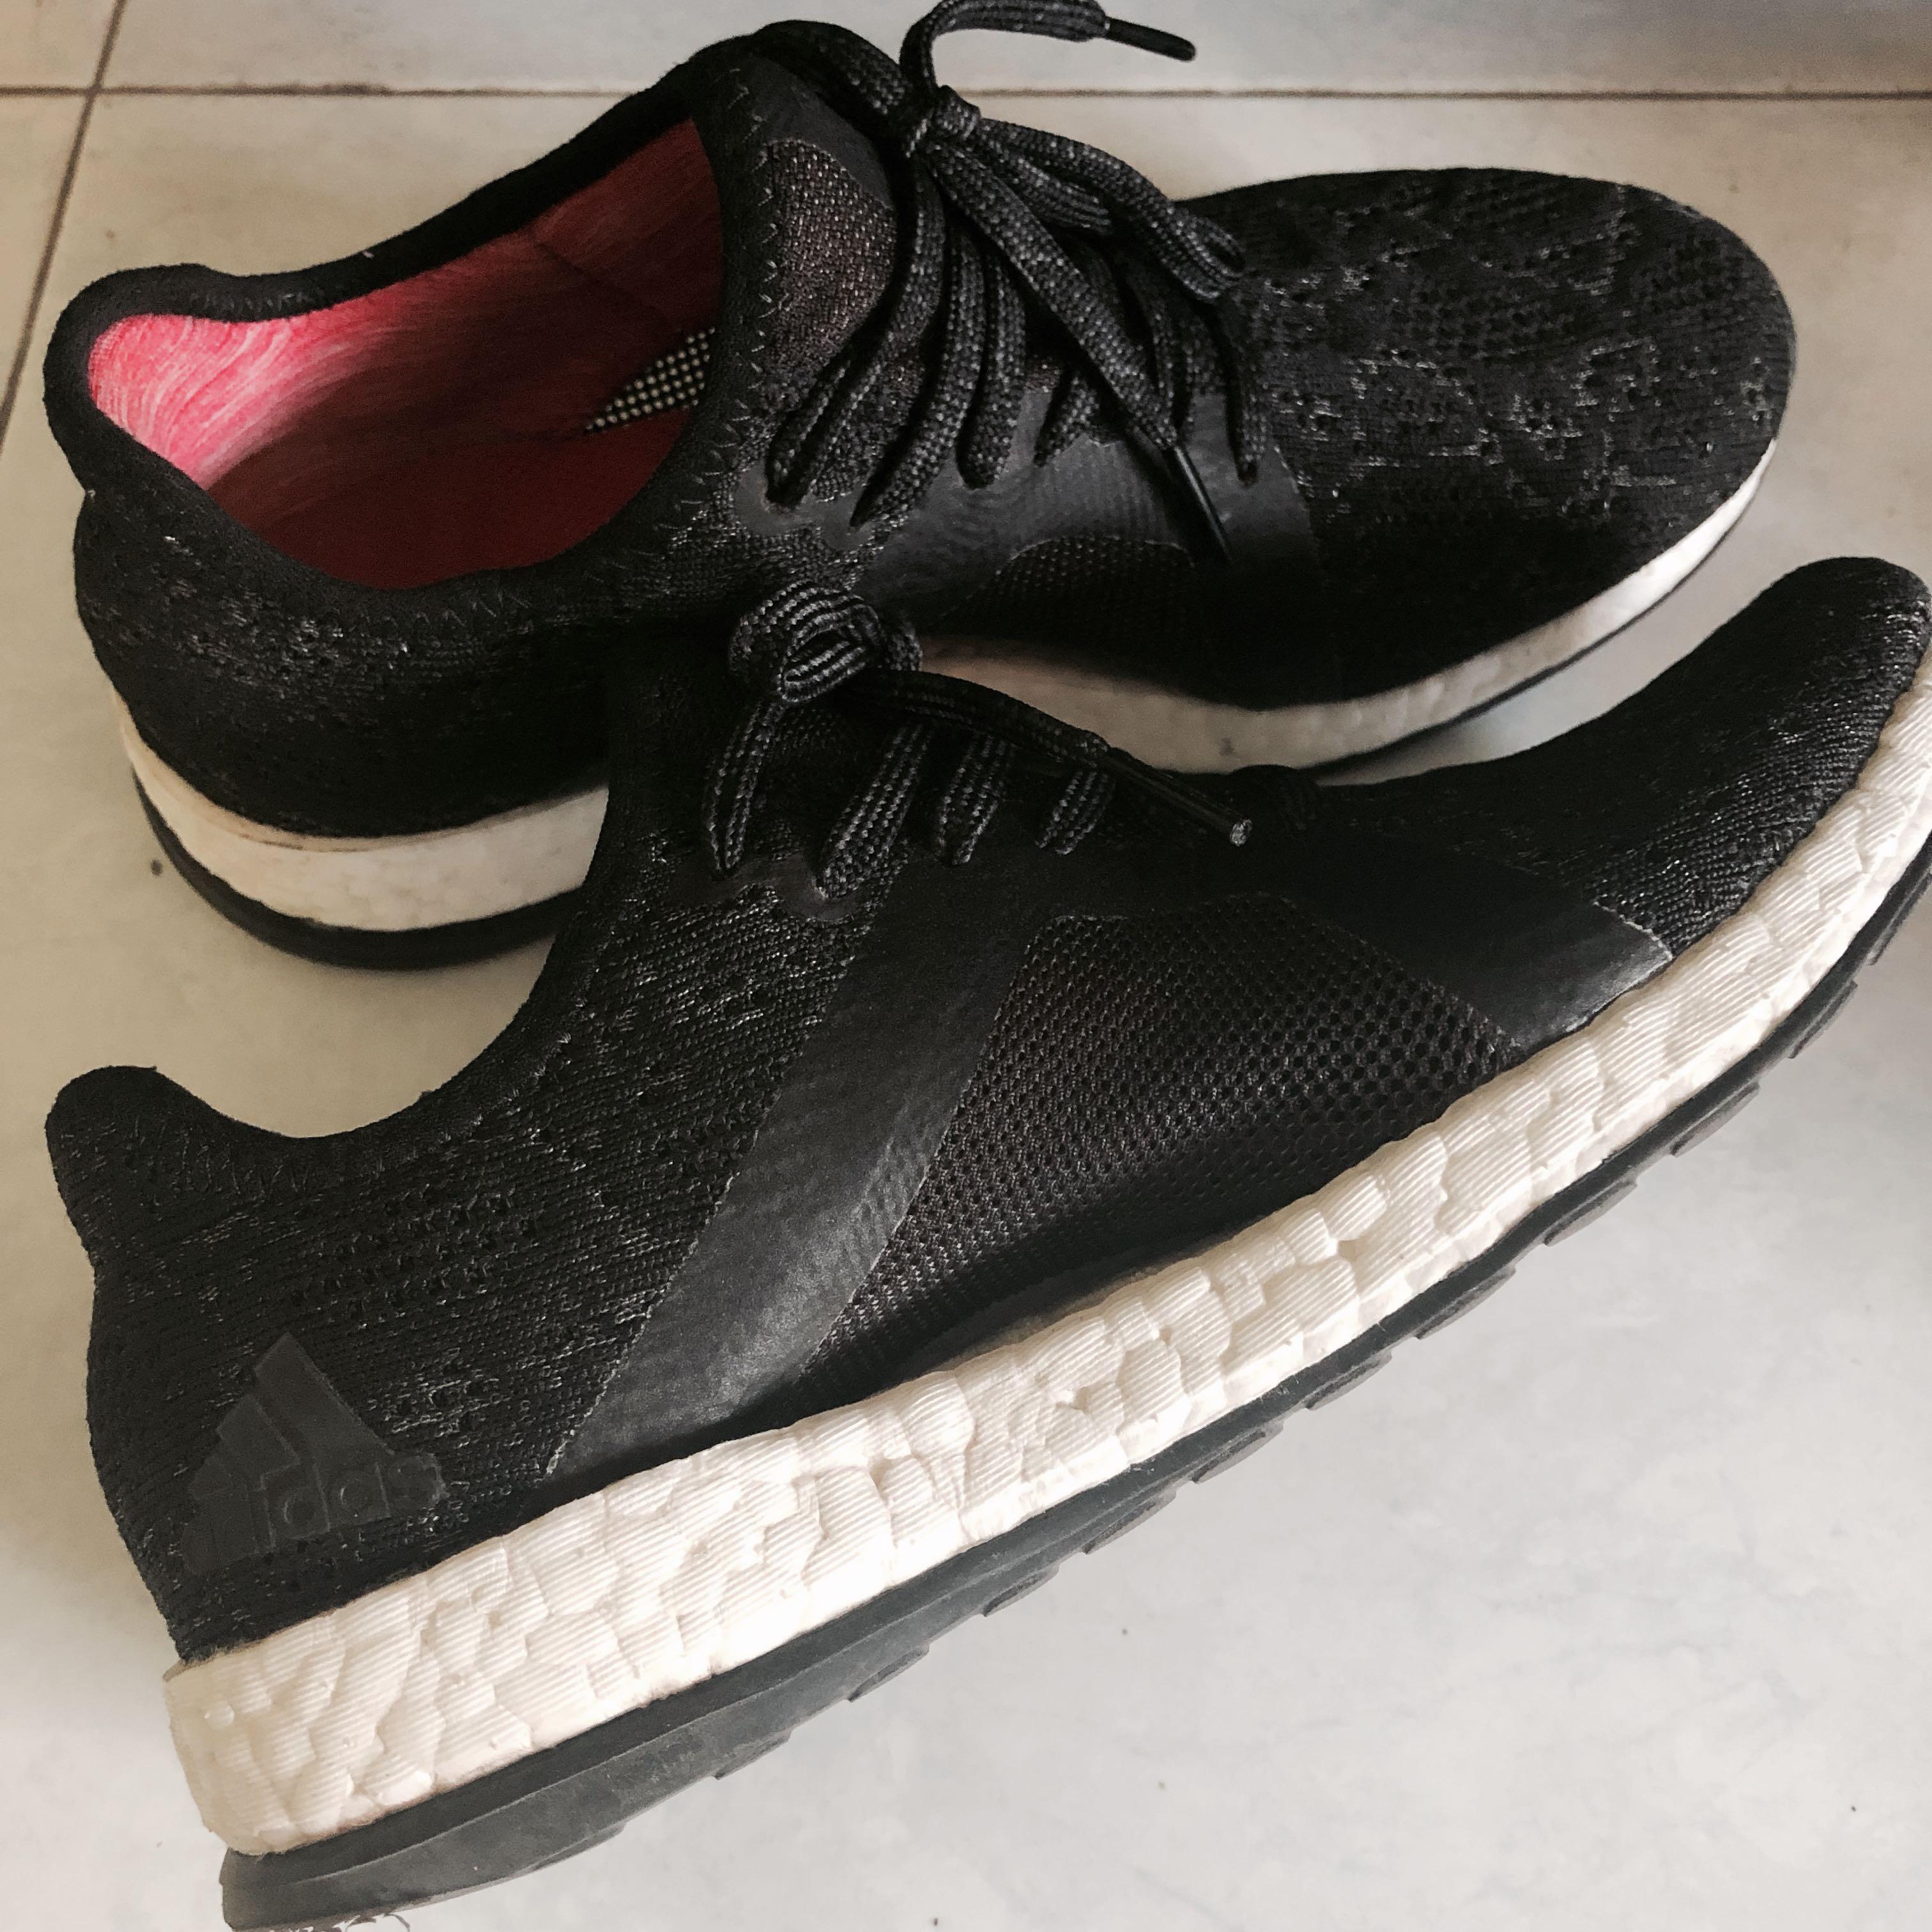 Adidas ultra boost running shoe, Sports